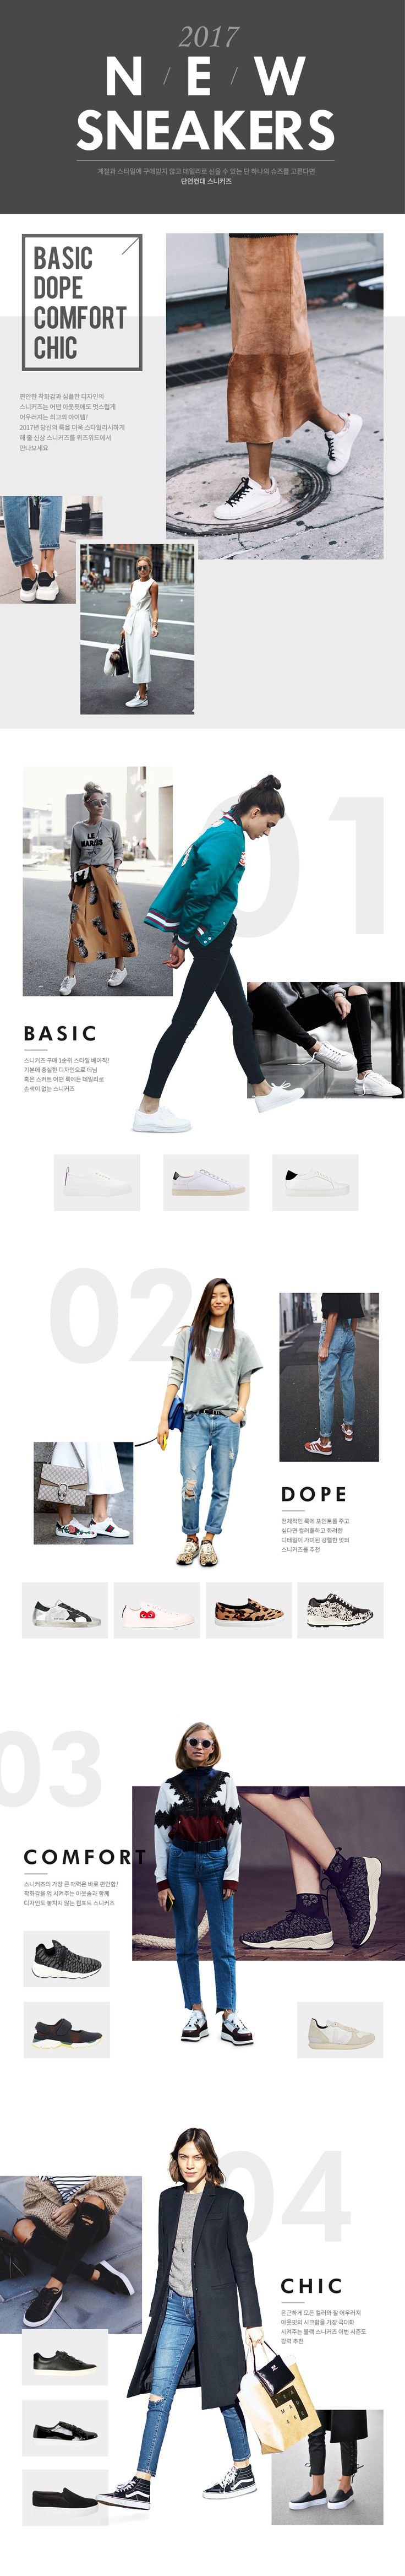 wizwid 위즈위드 기획전 2017 new sneakers